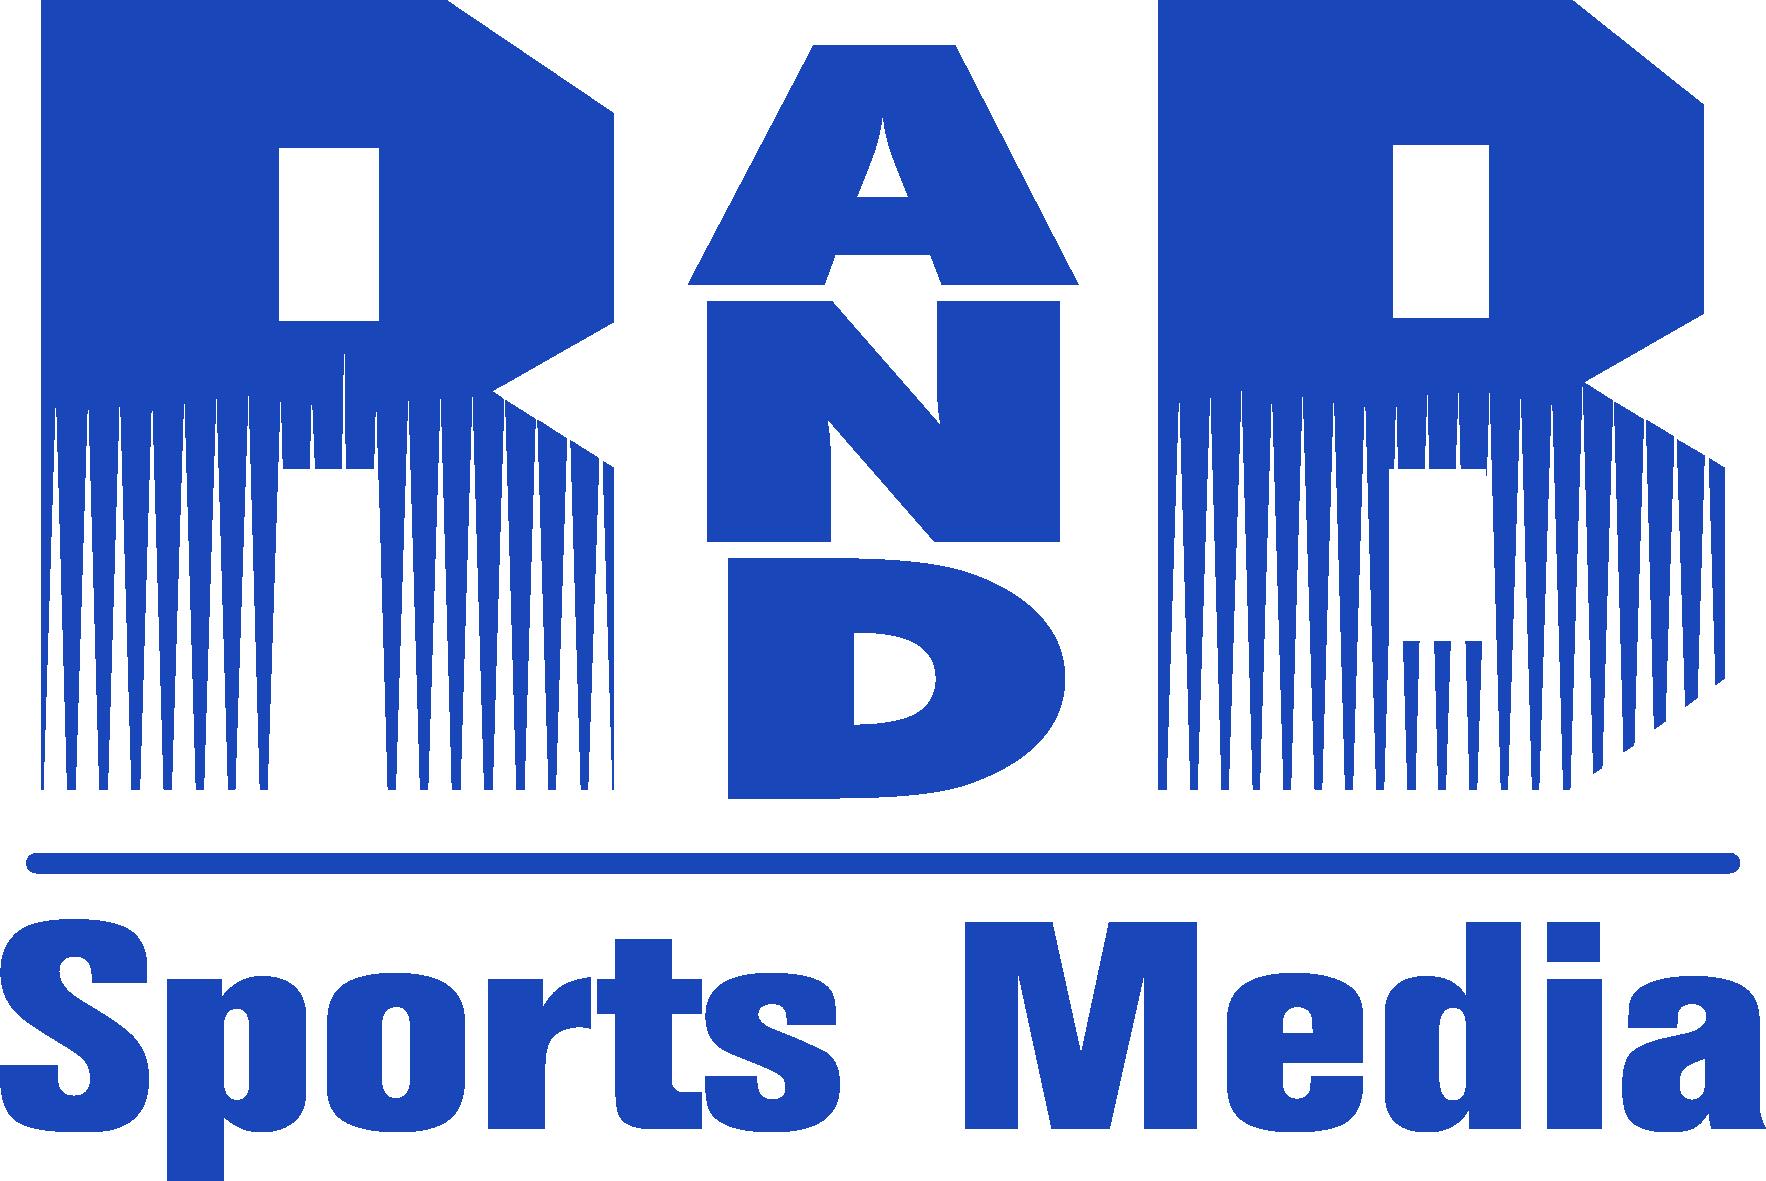 R and B Sports Media Logo